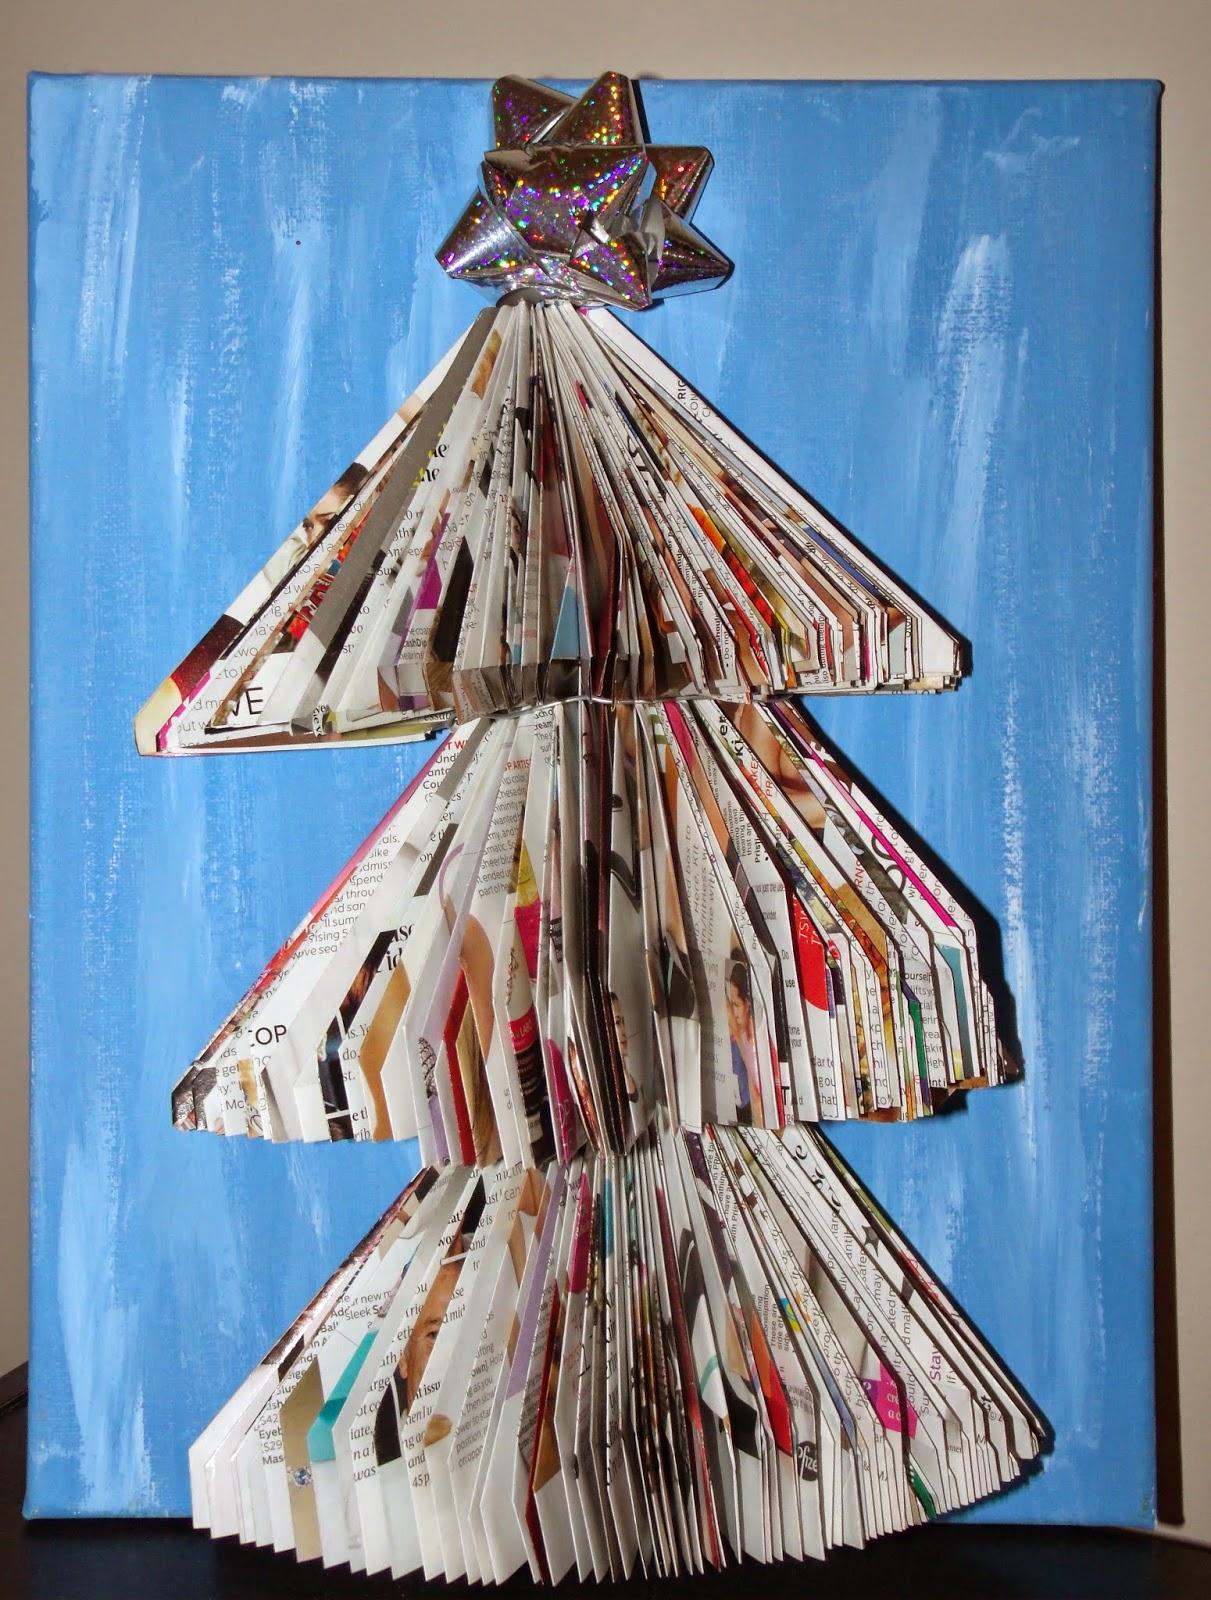 http://www.heartfeltbalancehandmadelife.com/2014/12/recycled-magazine-christmas-tree.html